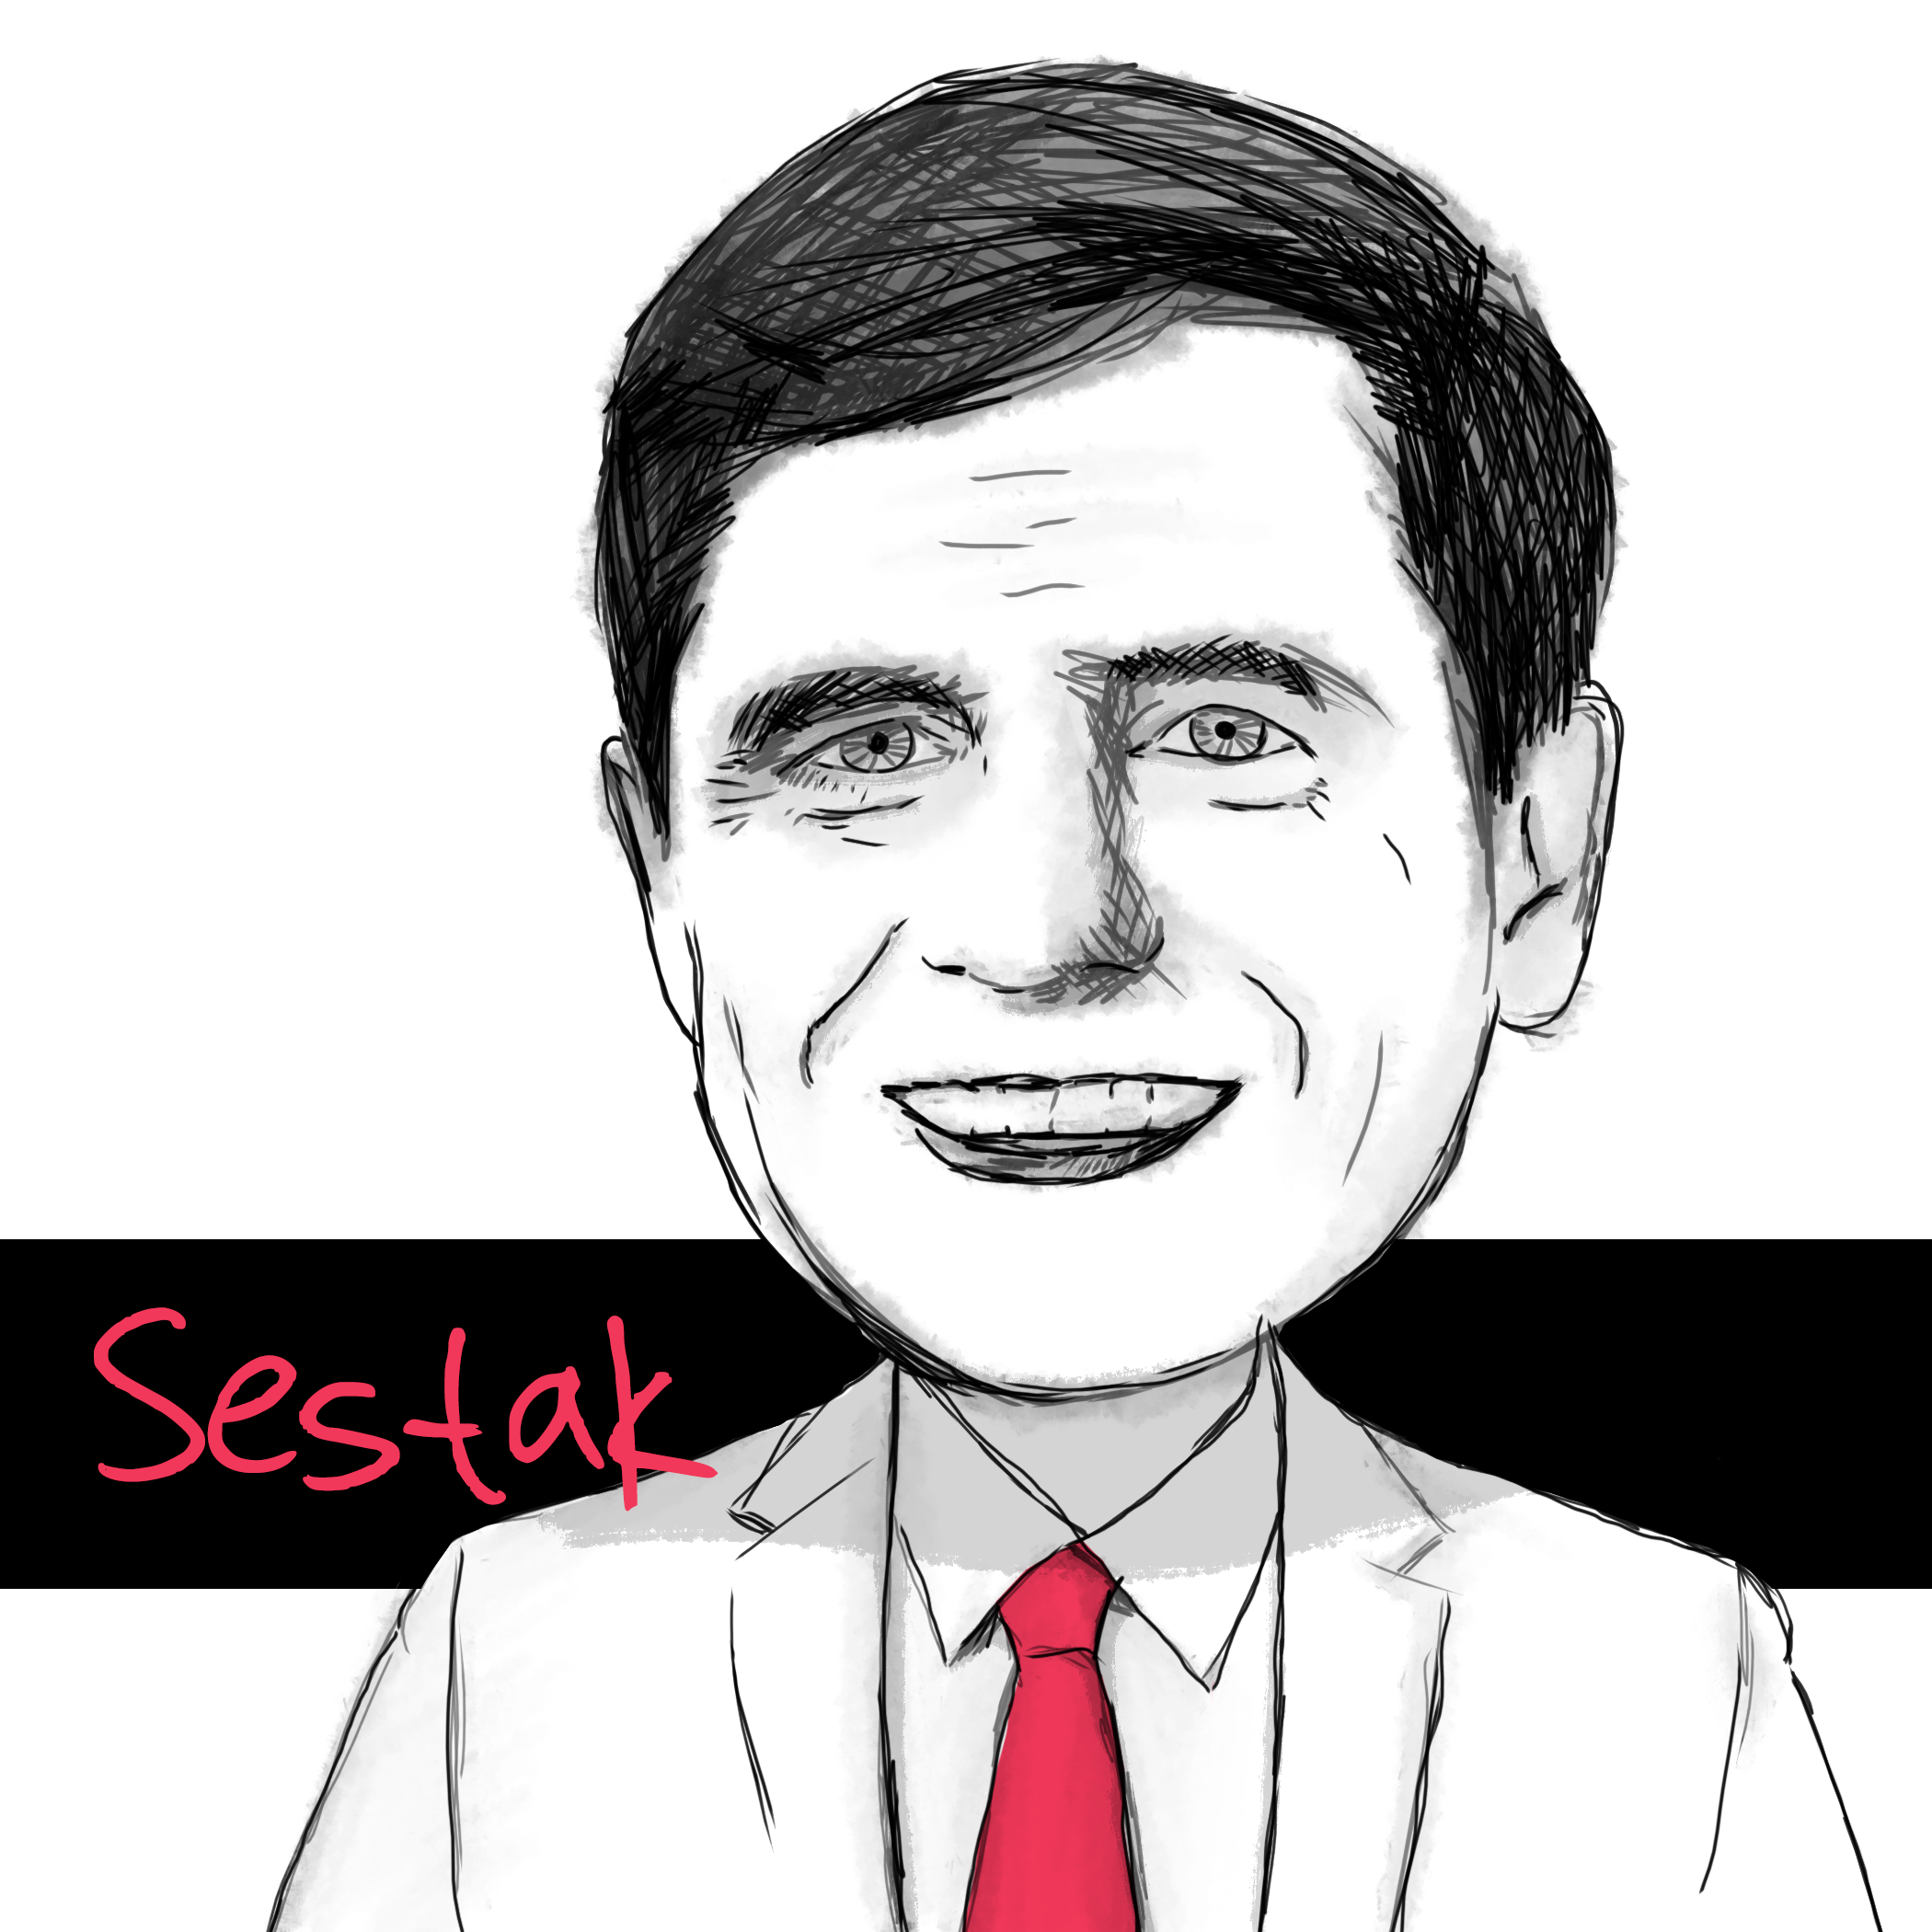 Joe Sestak - Accountability to America https://www.joesestak.com